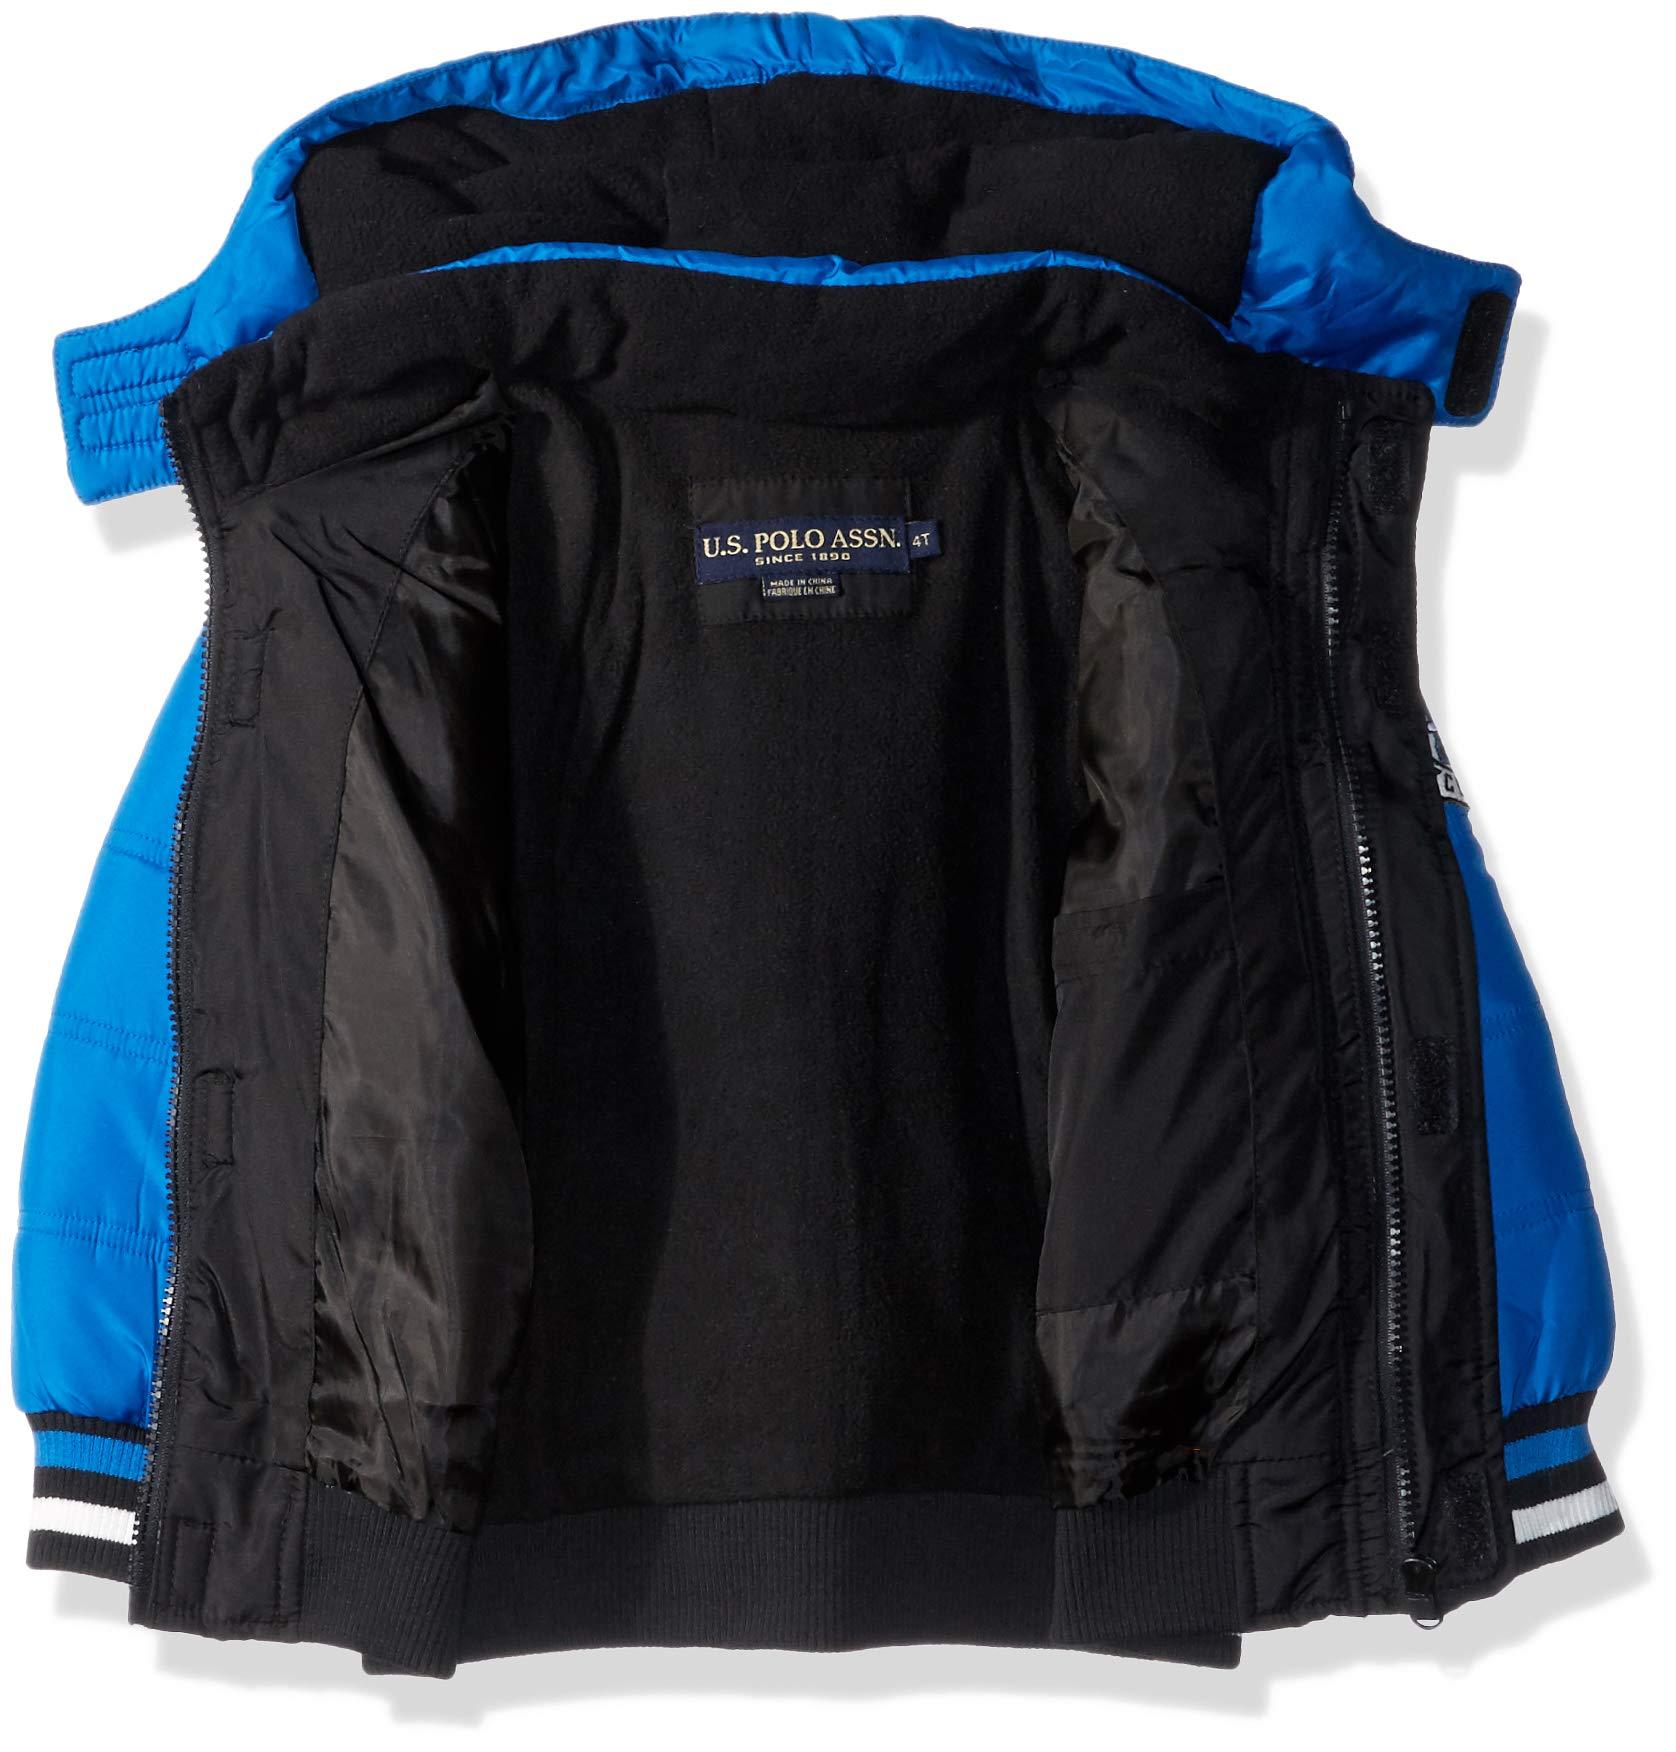 US Polo Association Boys' Big Bubble Jacket with Rib Knit Cuffs, Black/Blue Tile, 8 by U.S. Polo Assn. (Image #2)